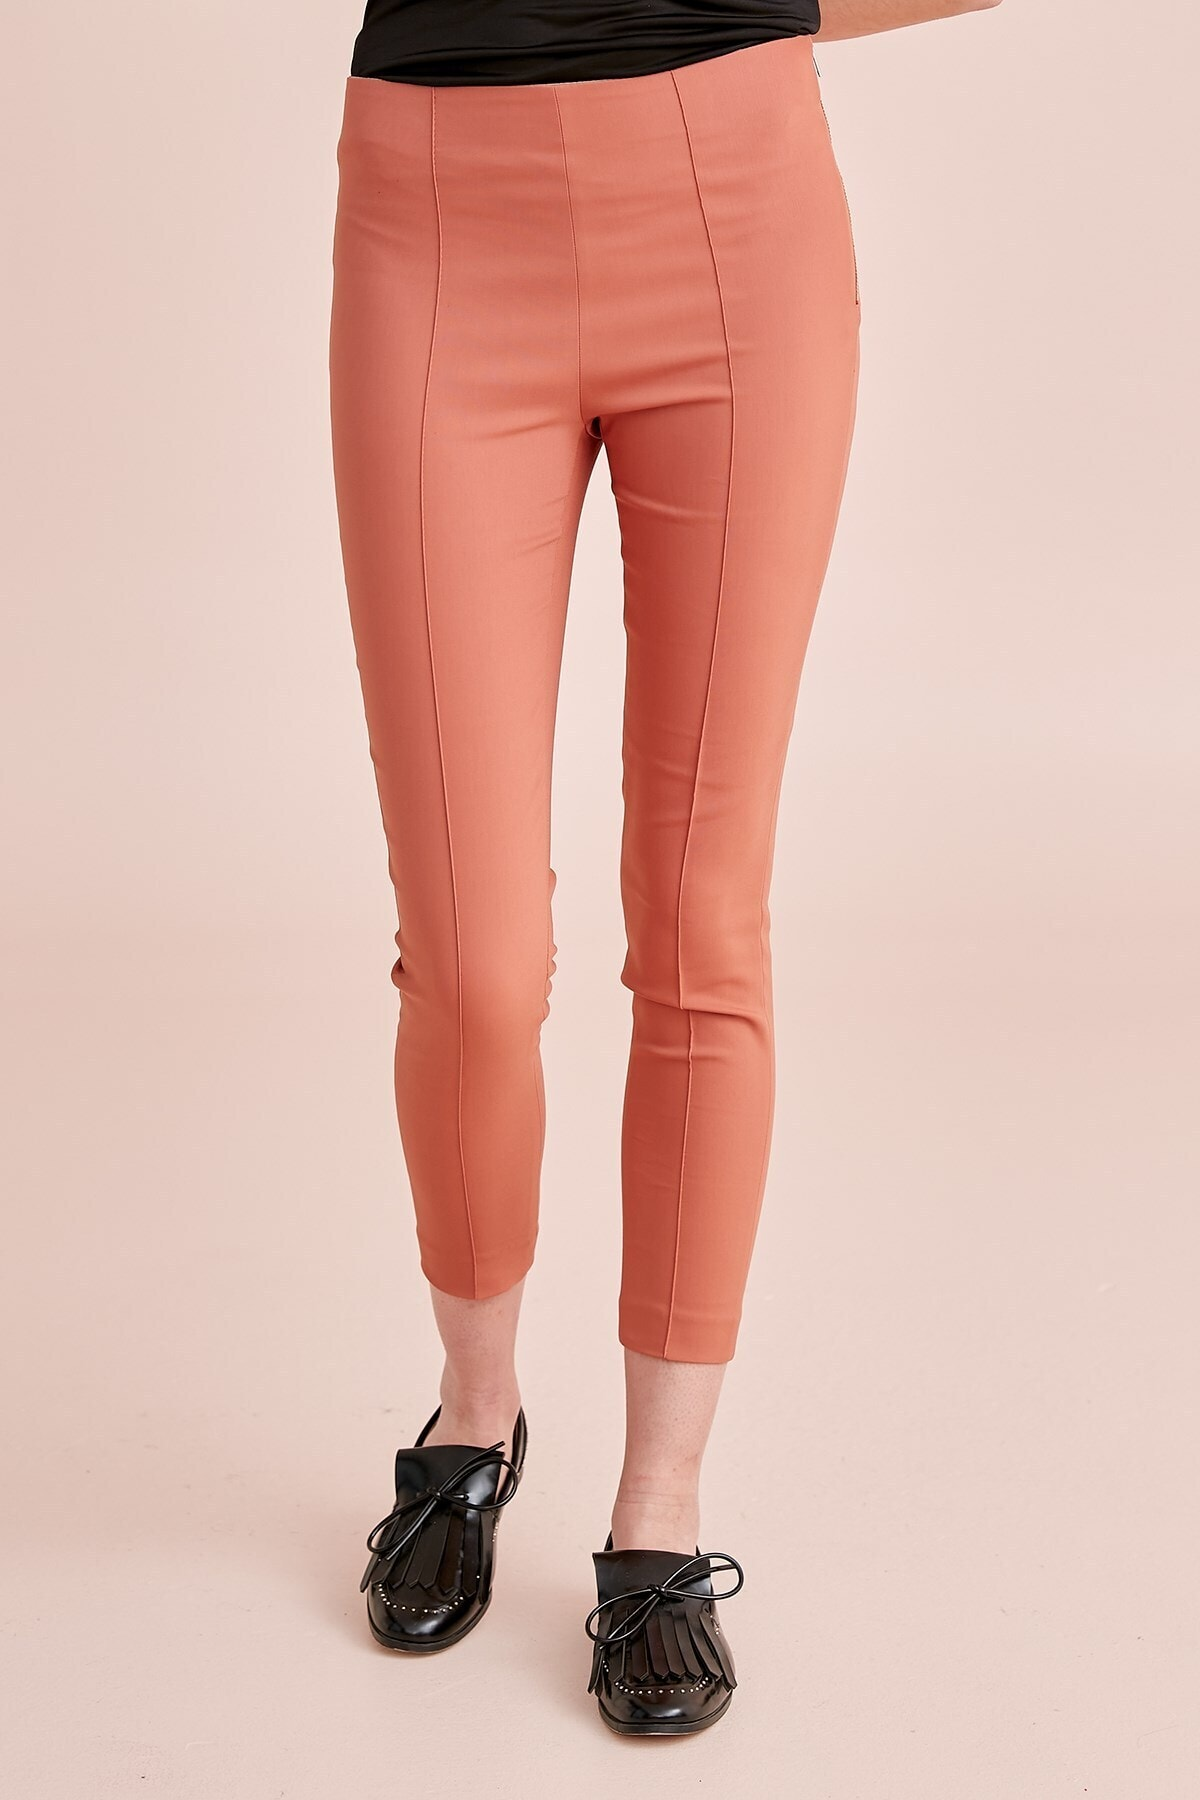 Pantolon -ütü Hattı Dikiş Detaylı, Yandan Fermuar Detaylı, Tayt